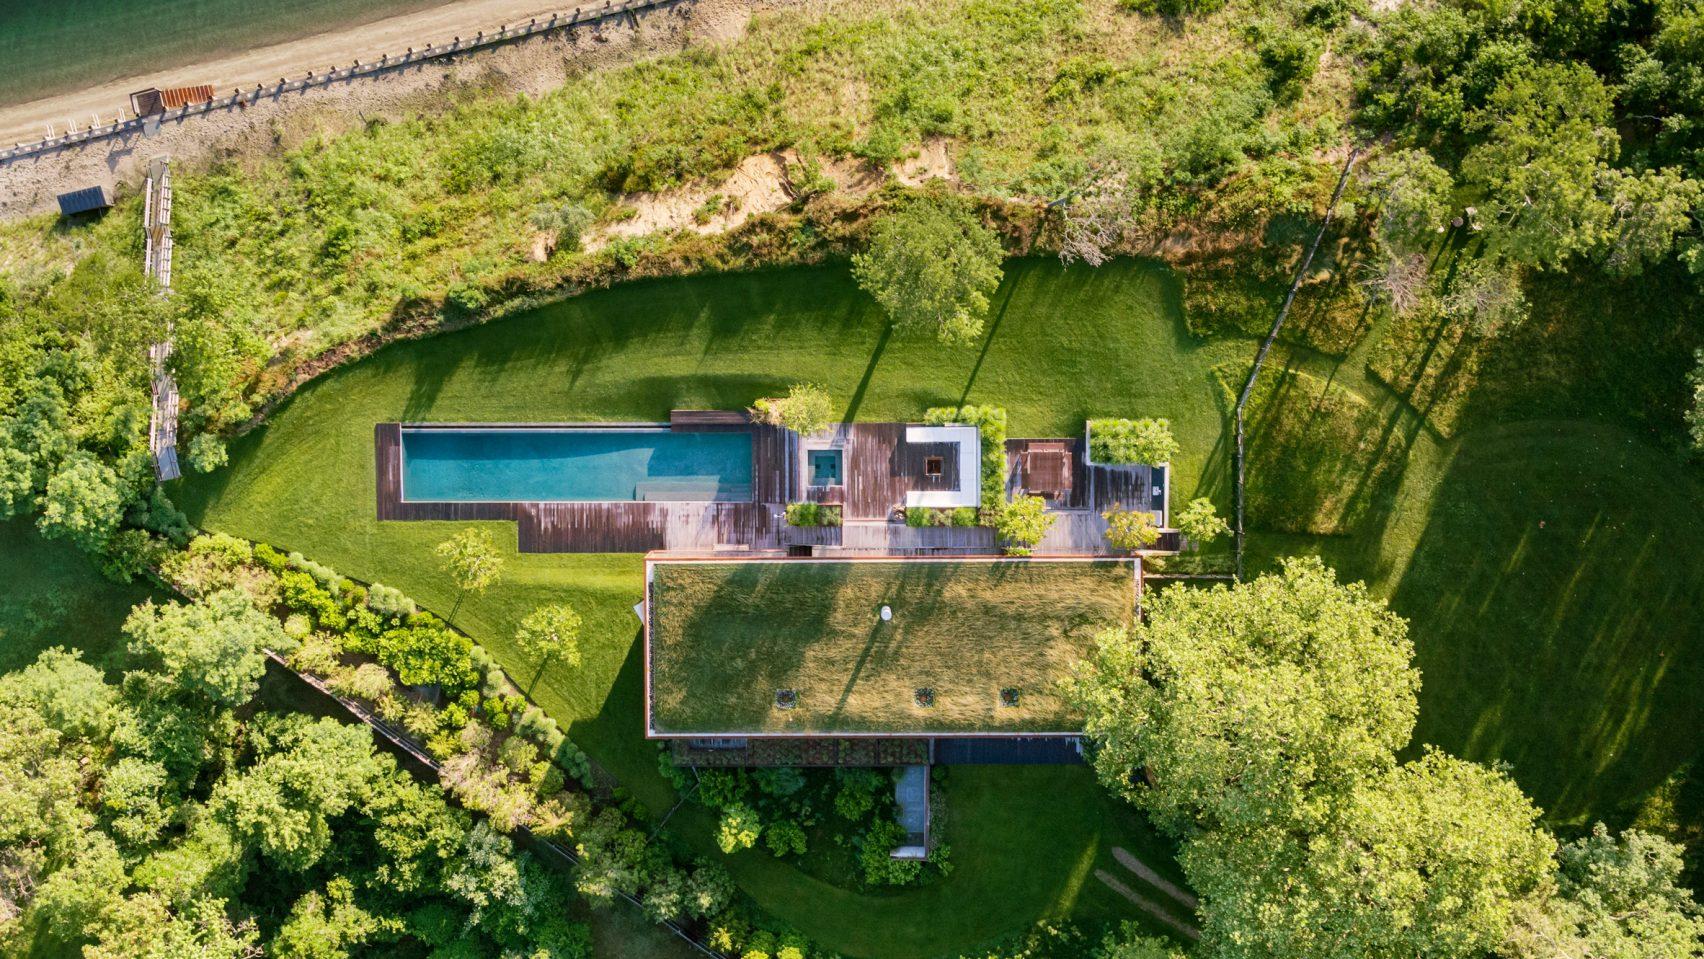 peconic-house-mapos-studio-hamptons-long-island-new-york_dezeen_hero-a-1704x959.jpg